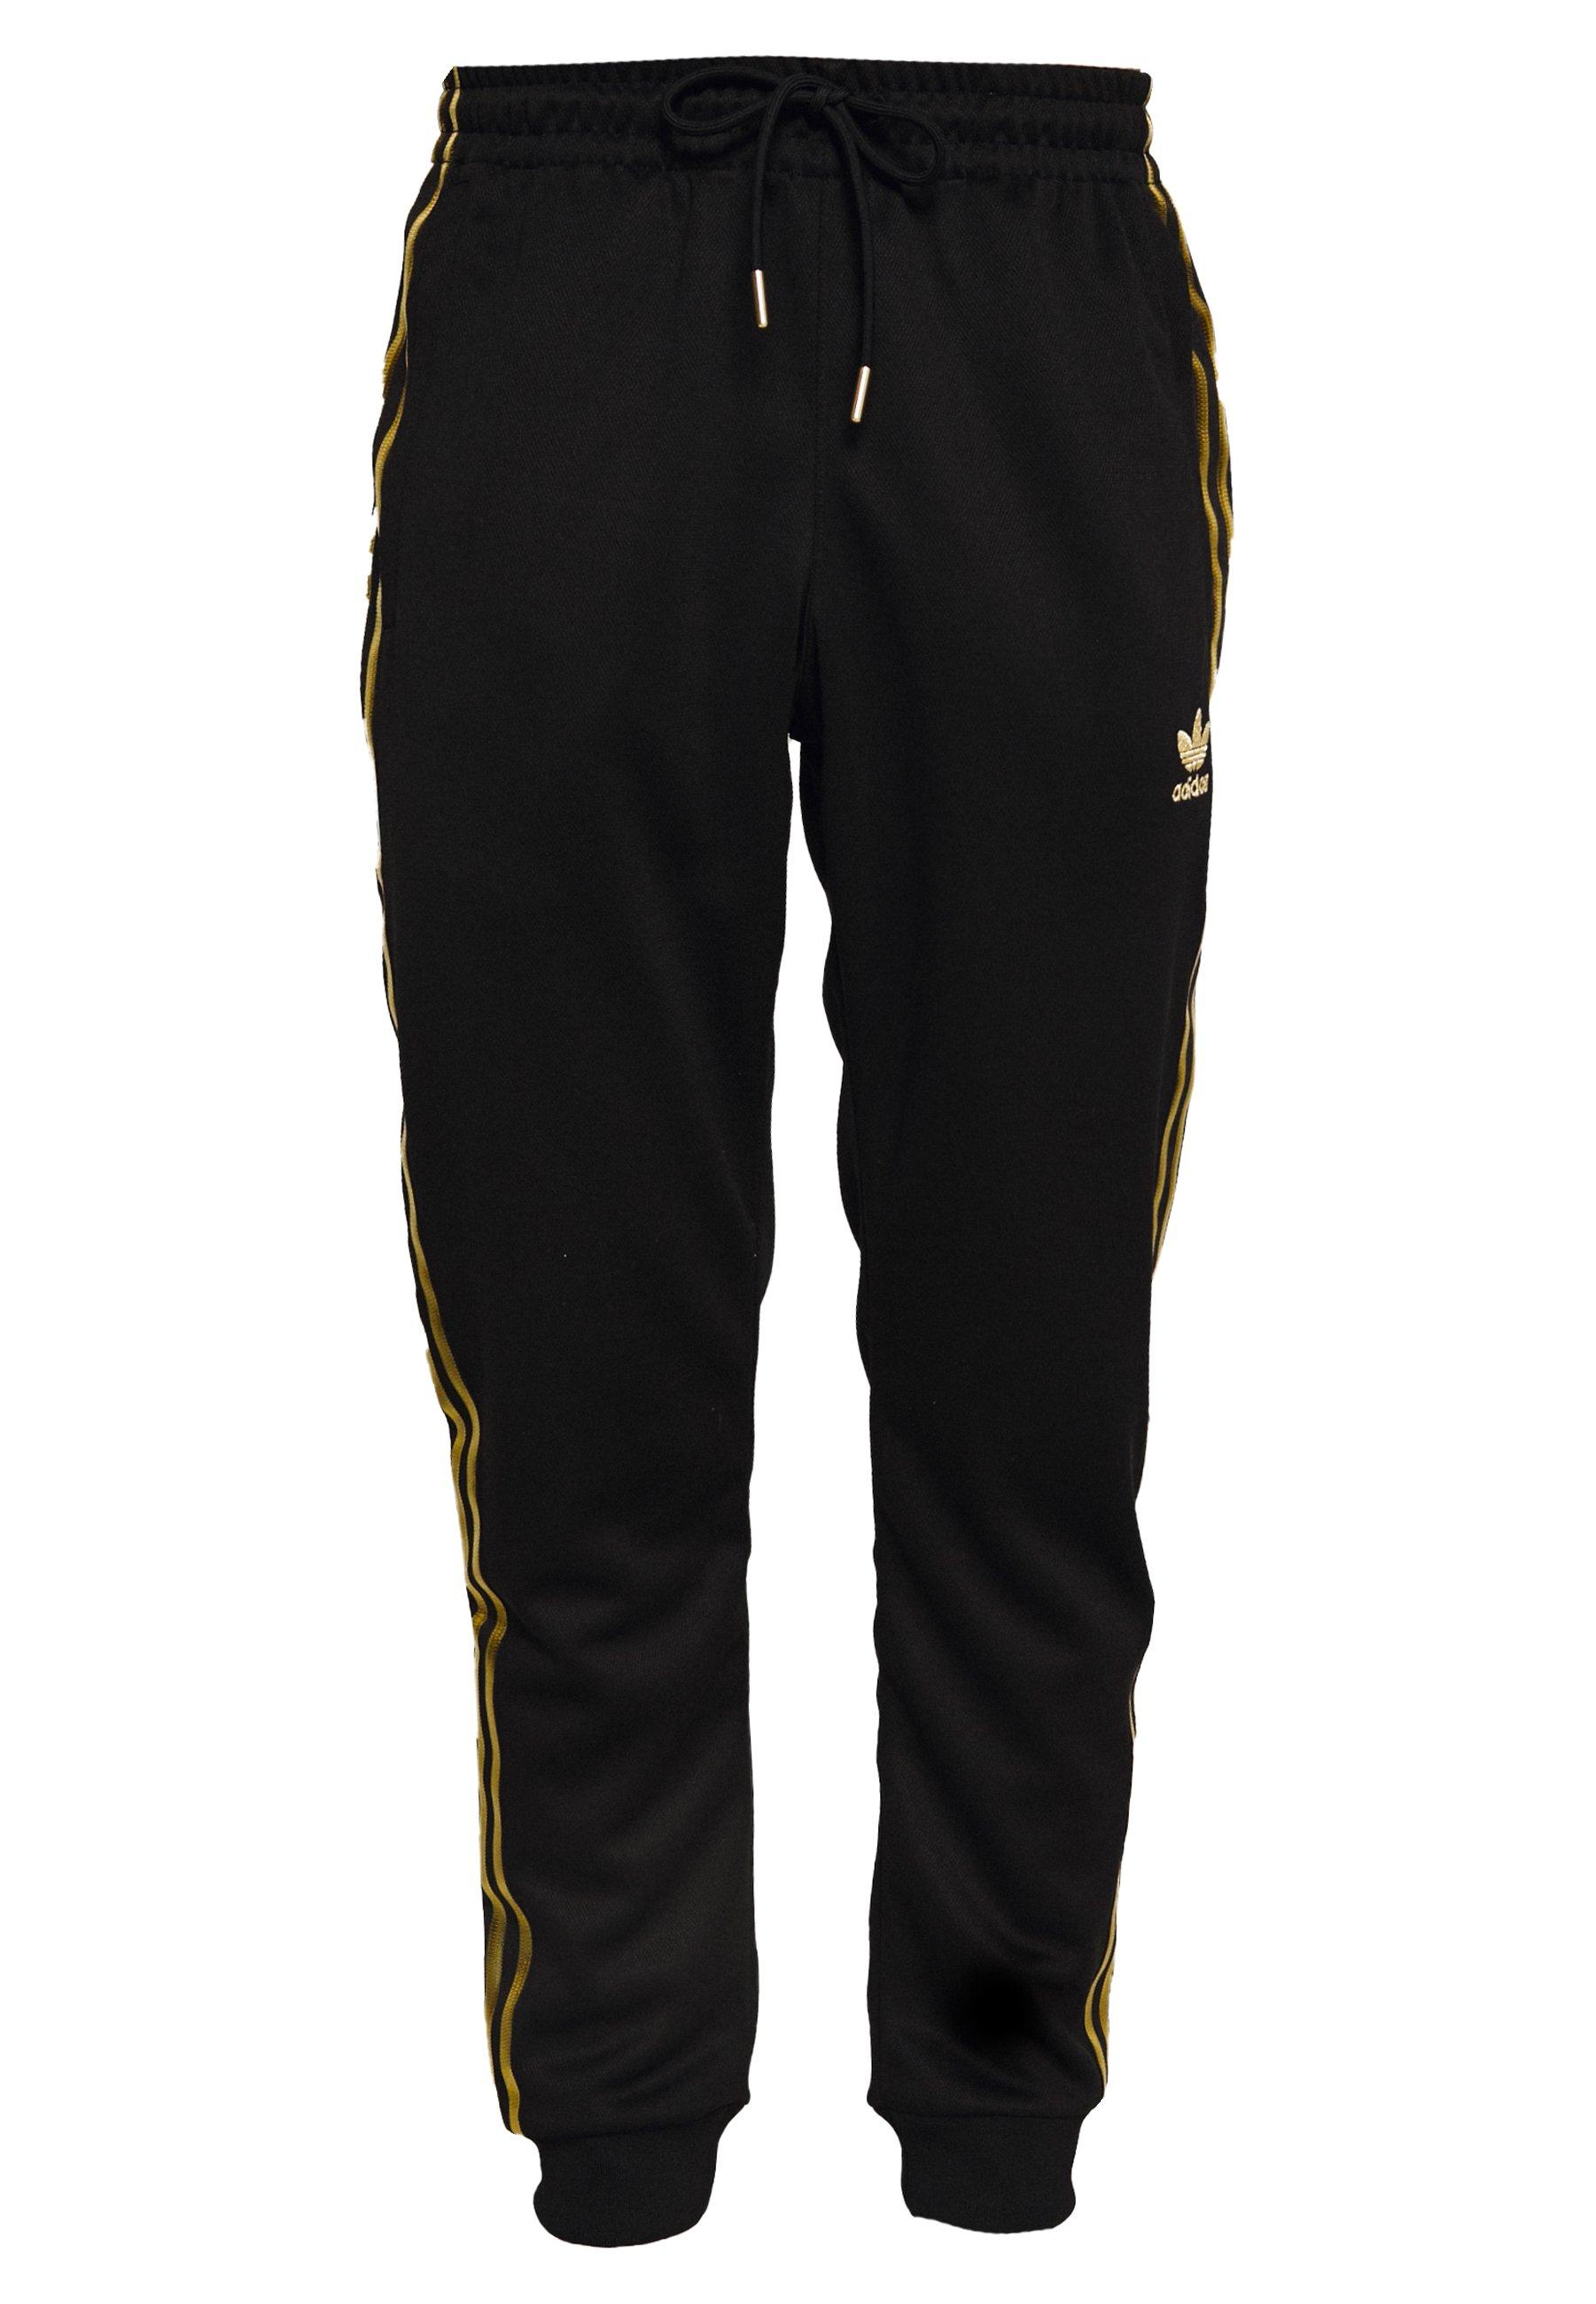 Adidas Originals Pantalon De Survêtement - Black/gold